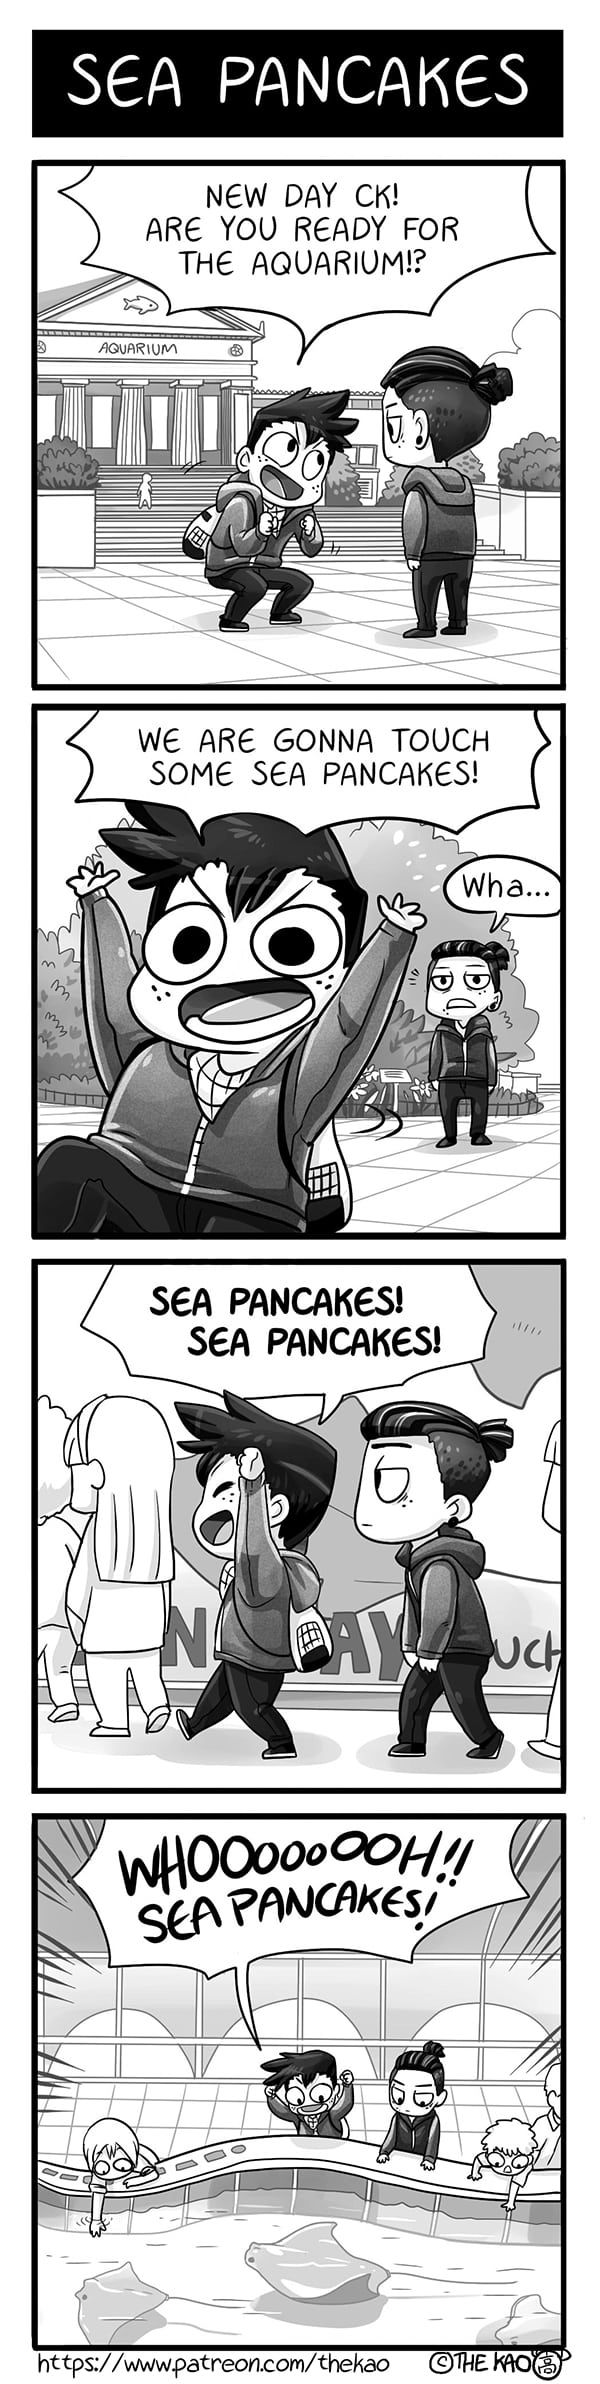 Mondo Mango :: Sea Pancakes | Tapastic Comics - image 1